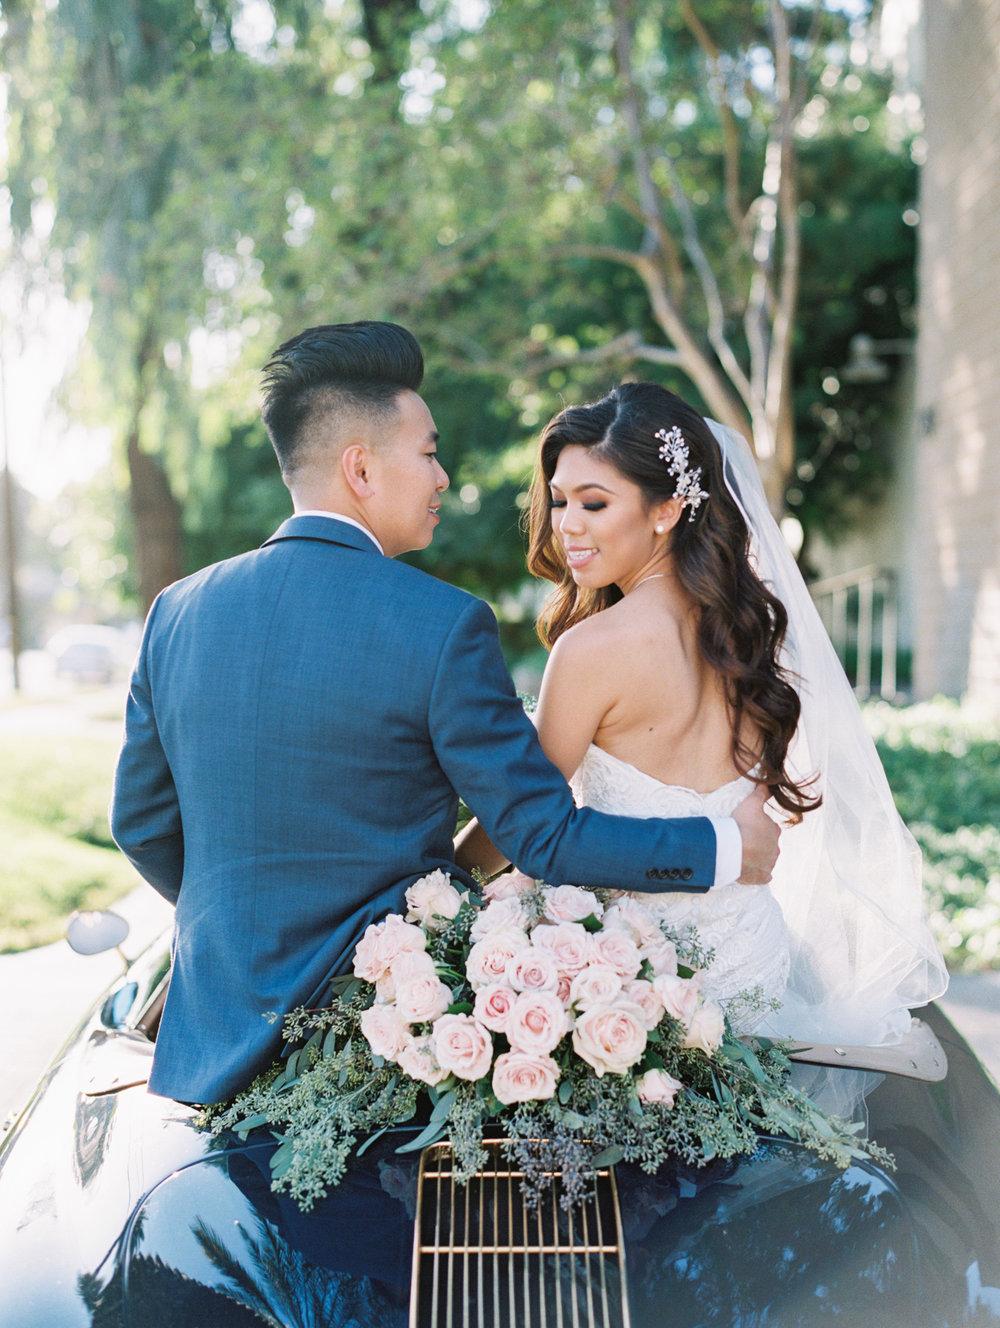 ChristineDomJonCu-Film-Wedding-Photographer48.jpg